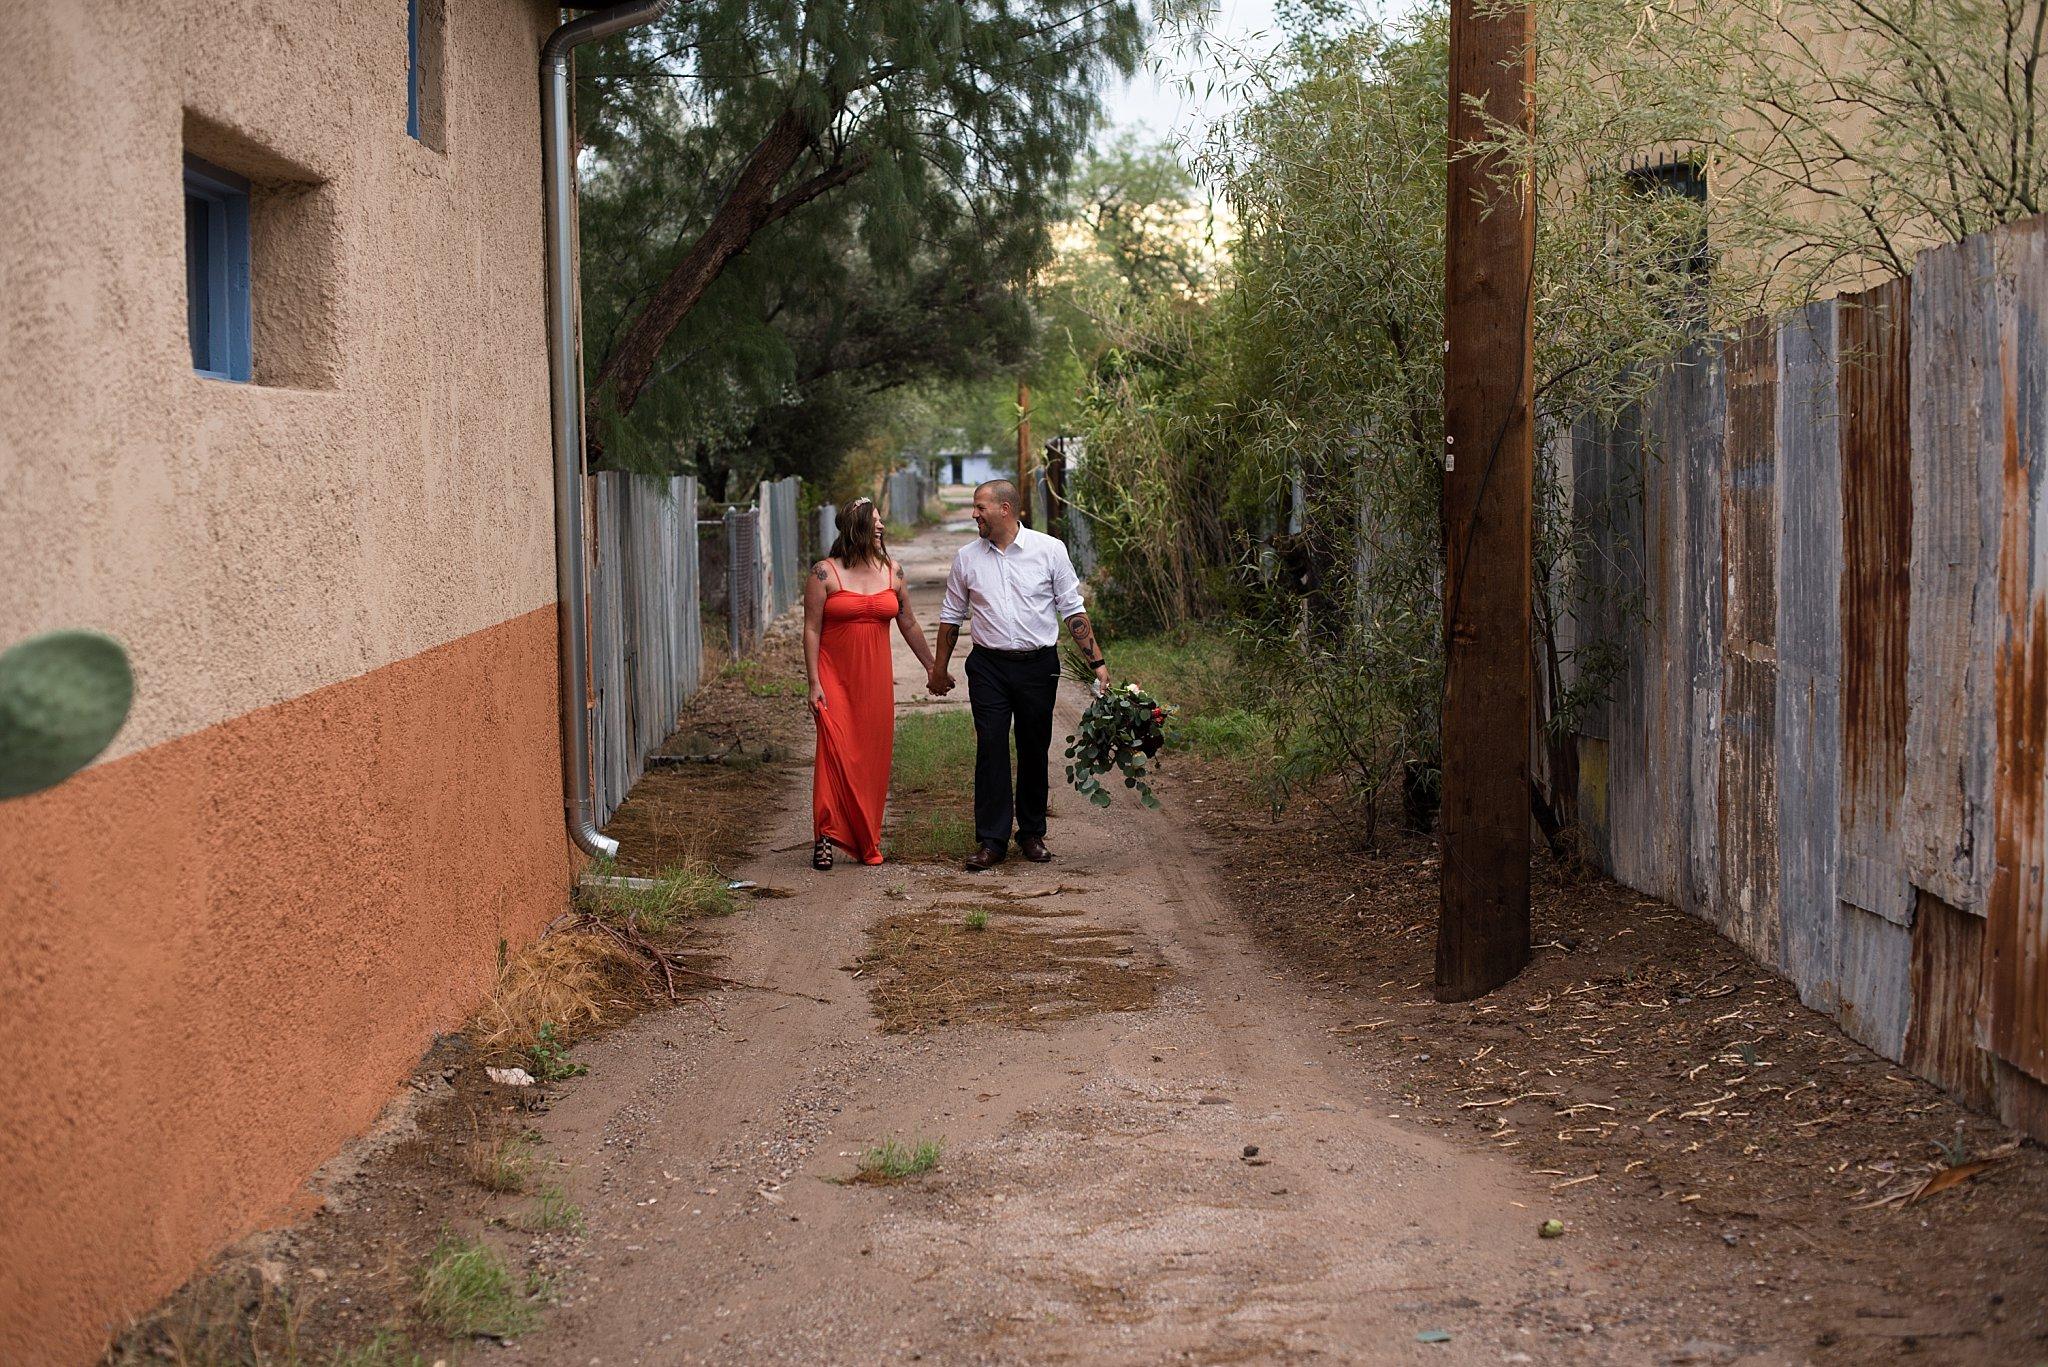 Downtown Tucson Historic Barrio